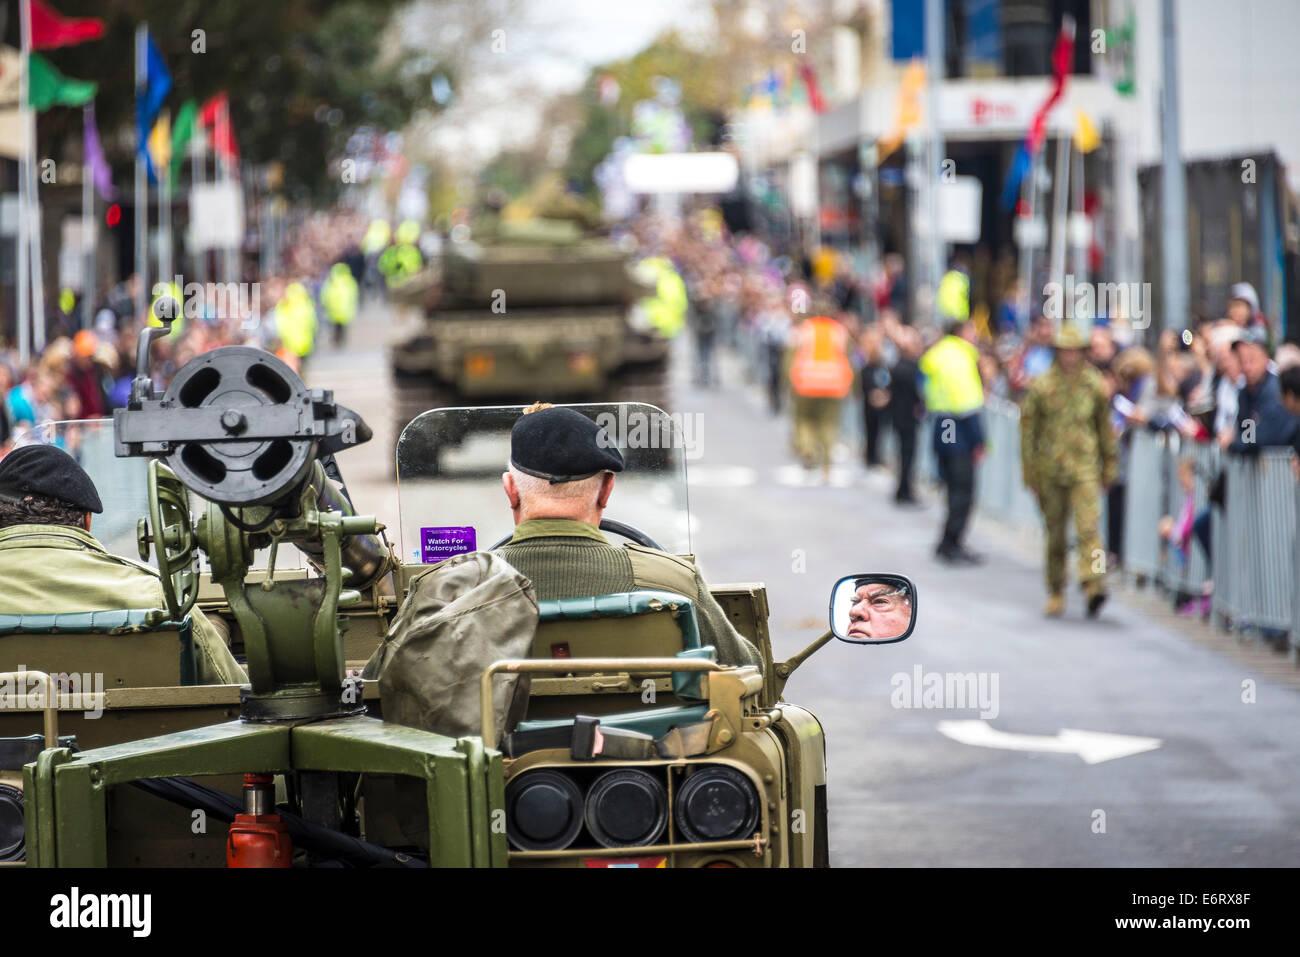 Light Cavalry Reconnaissance Land Rover follows the Centurian Mk5 Battle Tank in the parade down Macquarie Street, - Stock Image